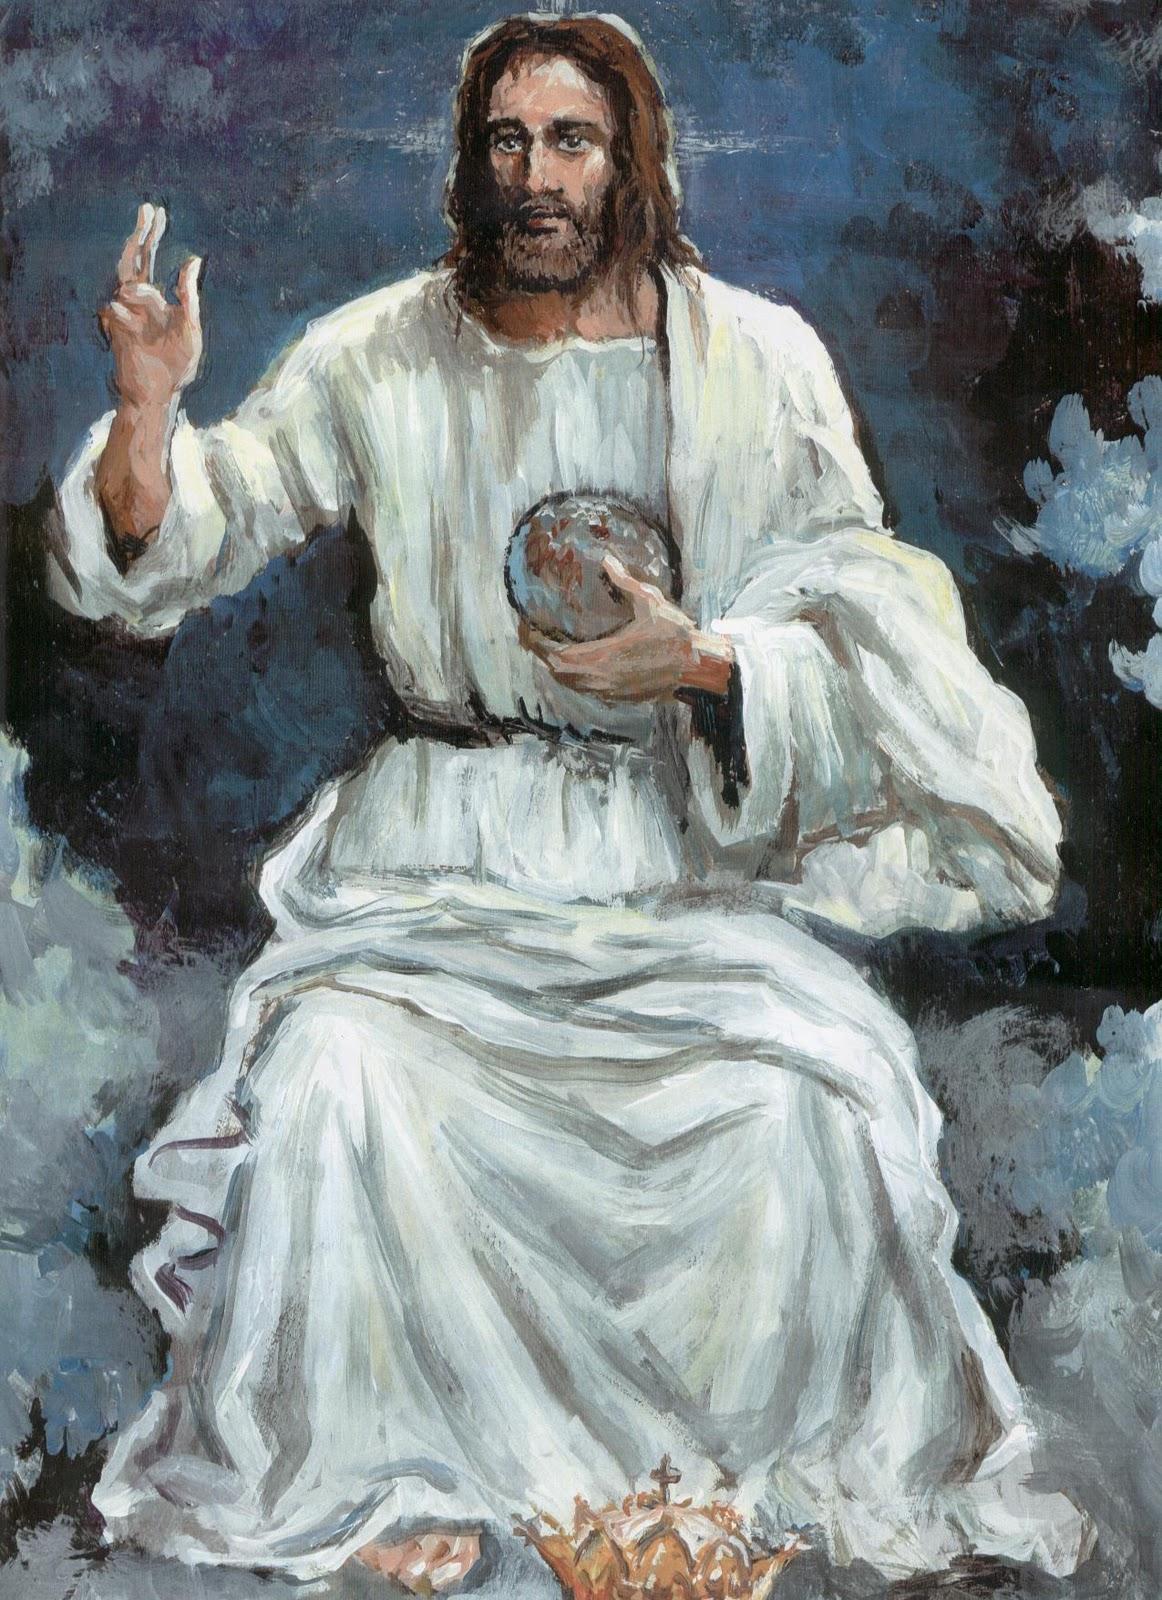 HEALING GRACE: PRAYERS TO GOD THE FATHER (Deus Abba)